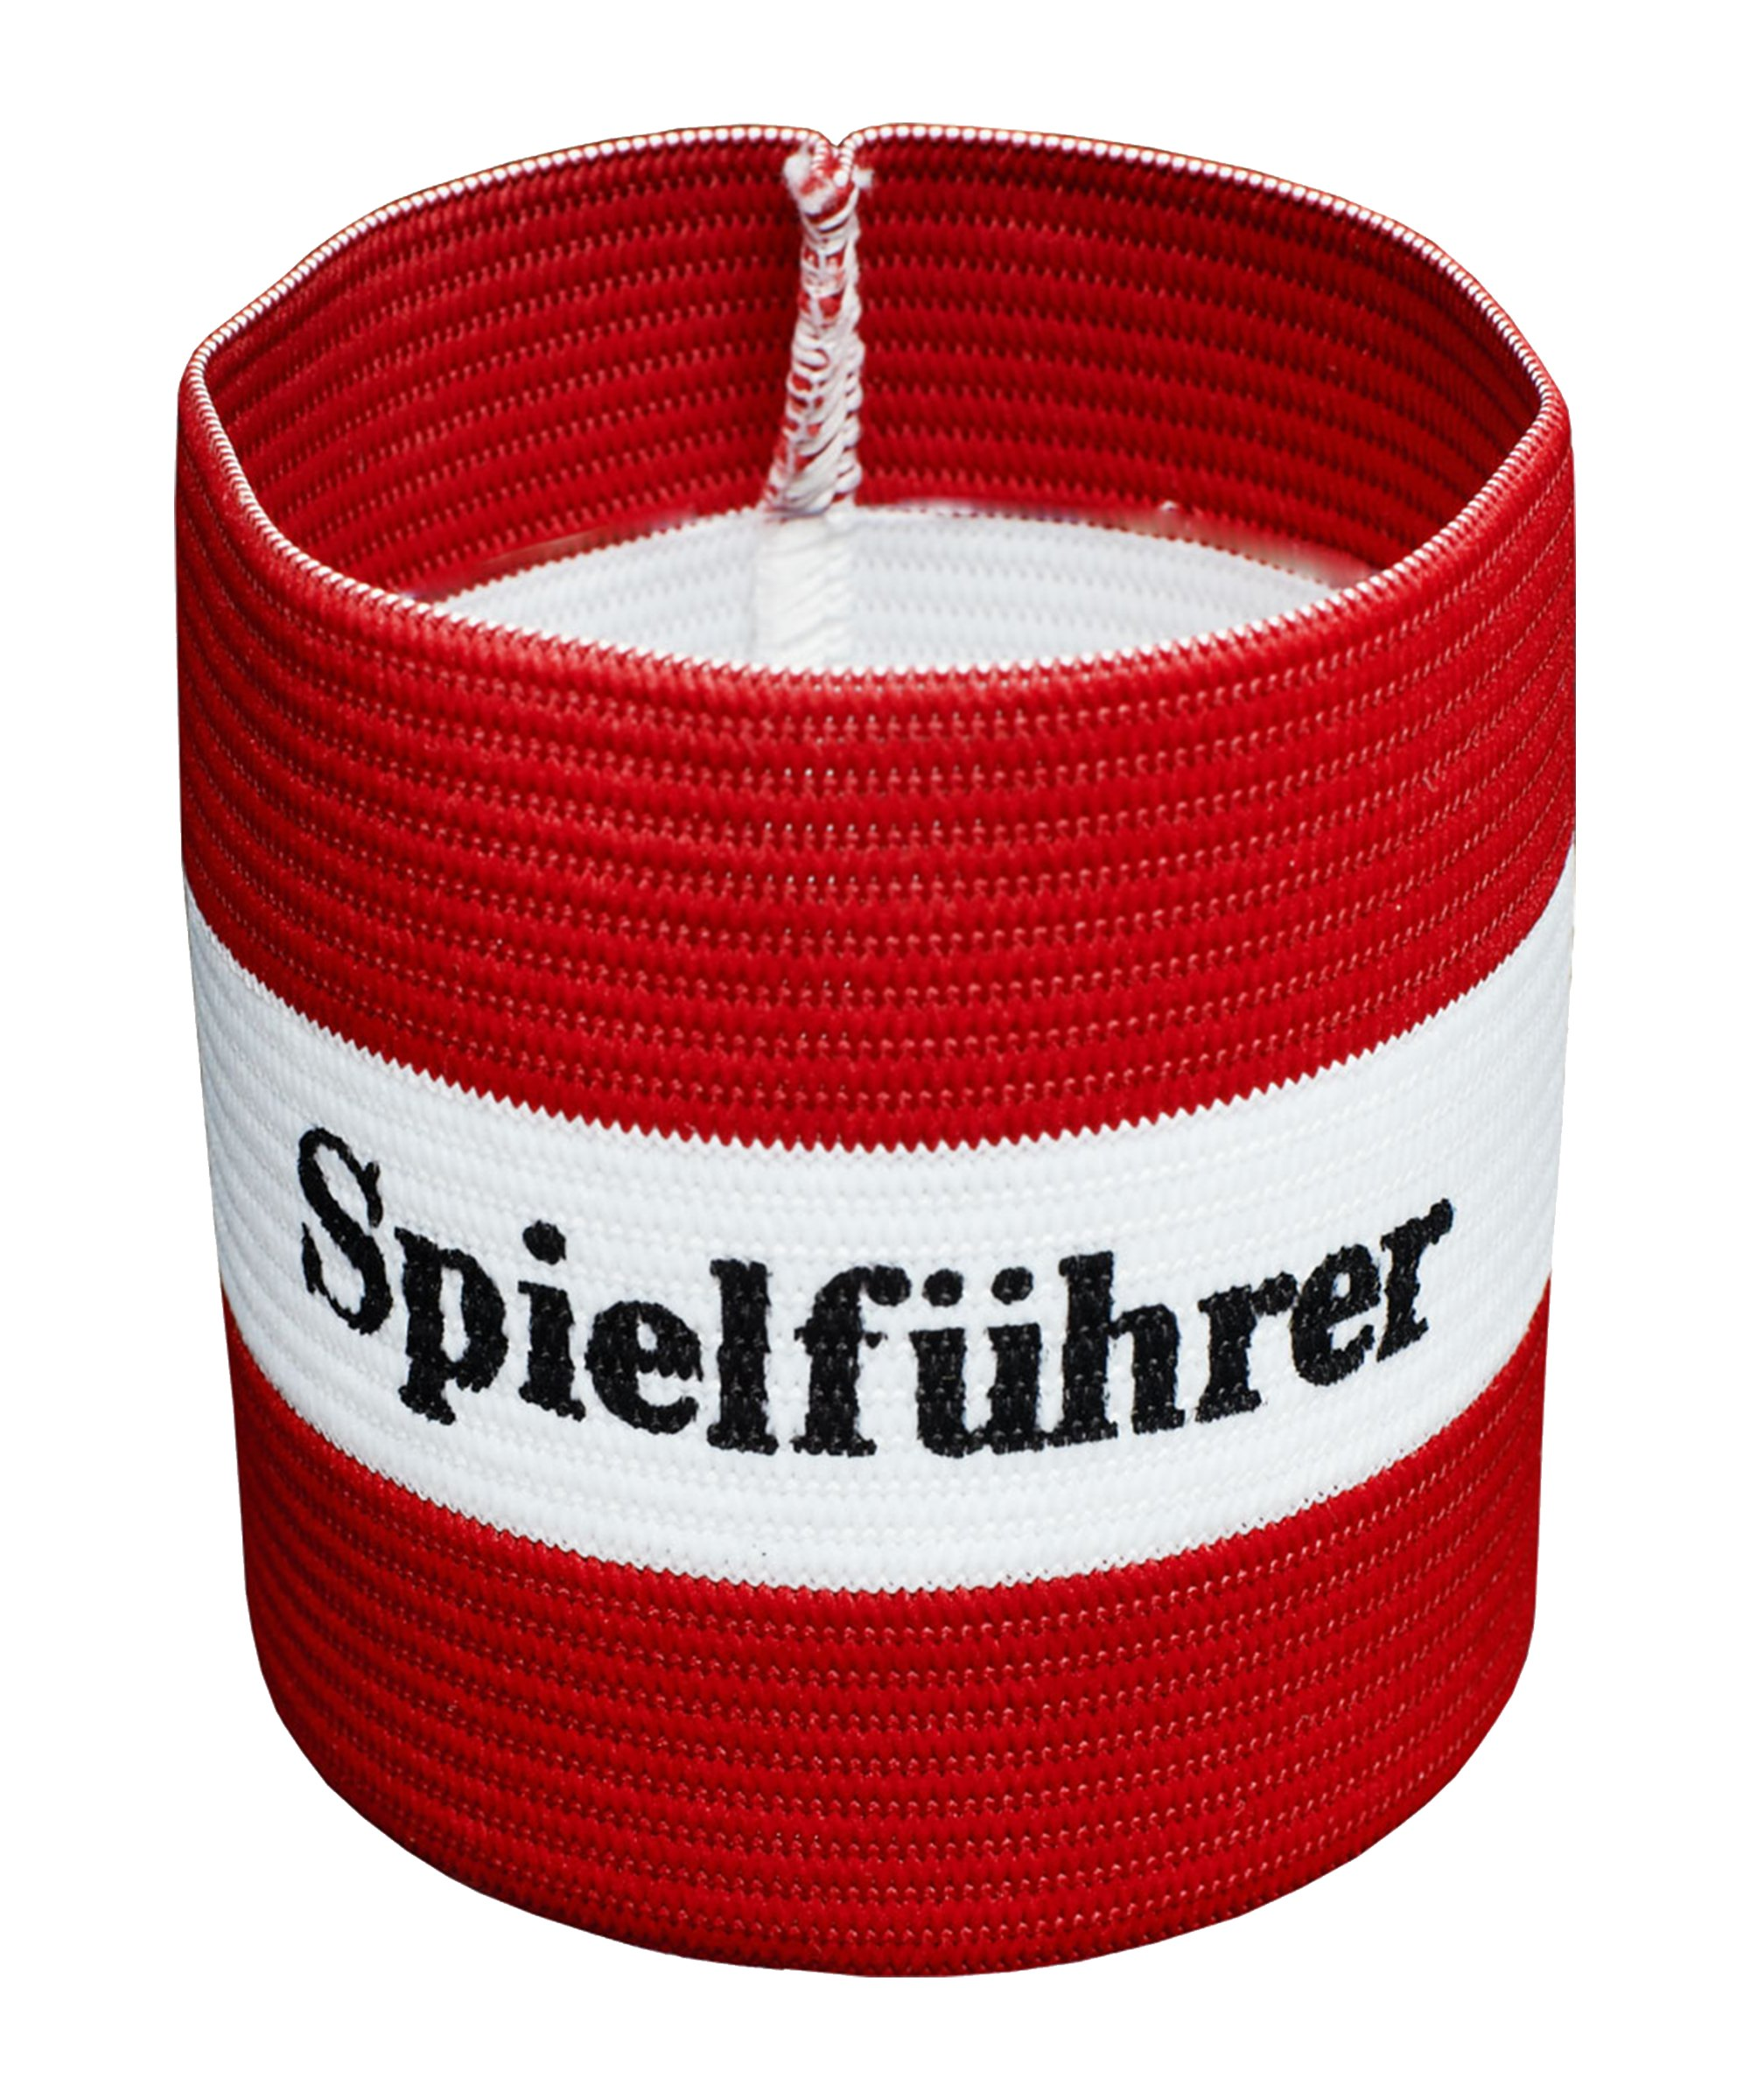 Cawila Spielführer Armbinde Junior Rot - rot